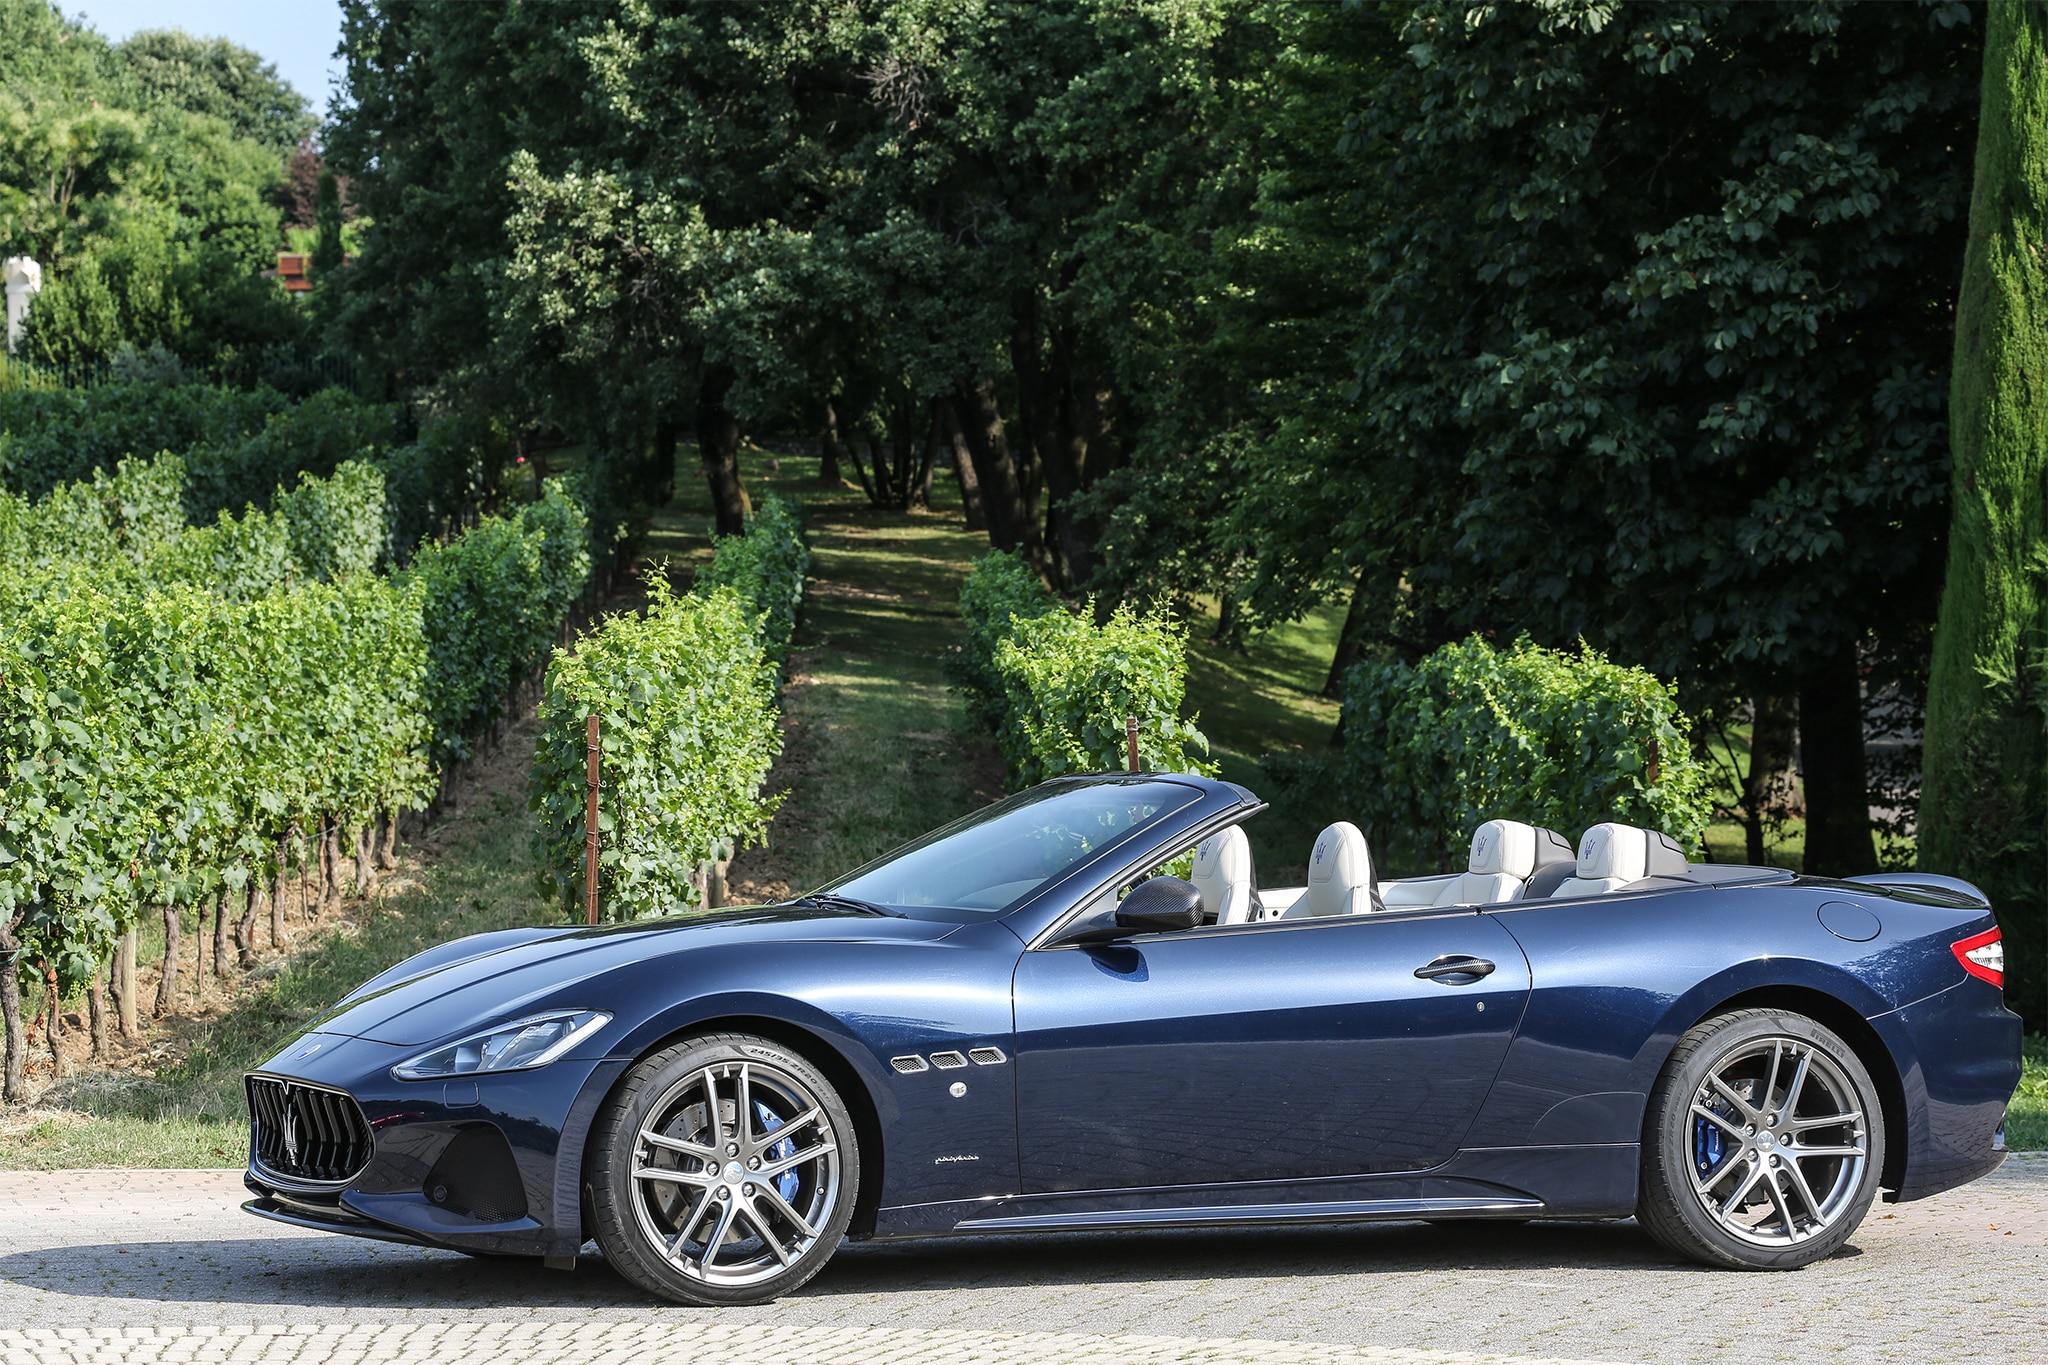 http://st.automobilemag.com/uploads/sites/11/2017/07/2018-Maserati-GranCabrio-Sport-side-profile-02.jpg